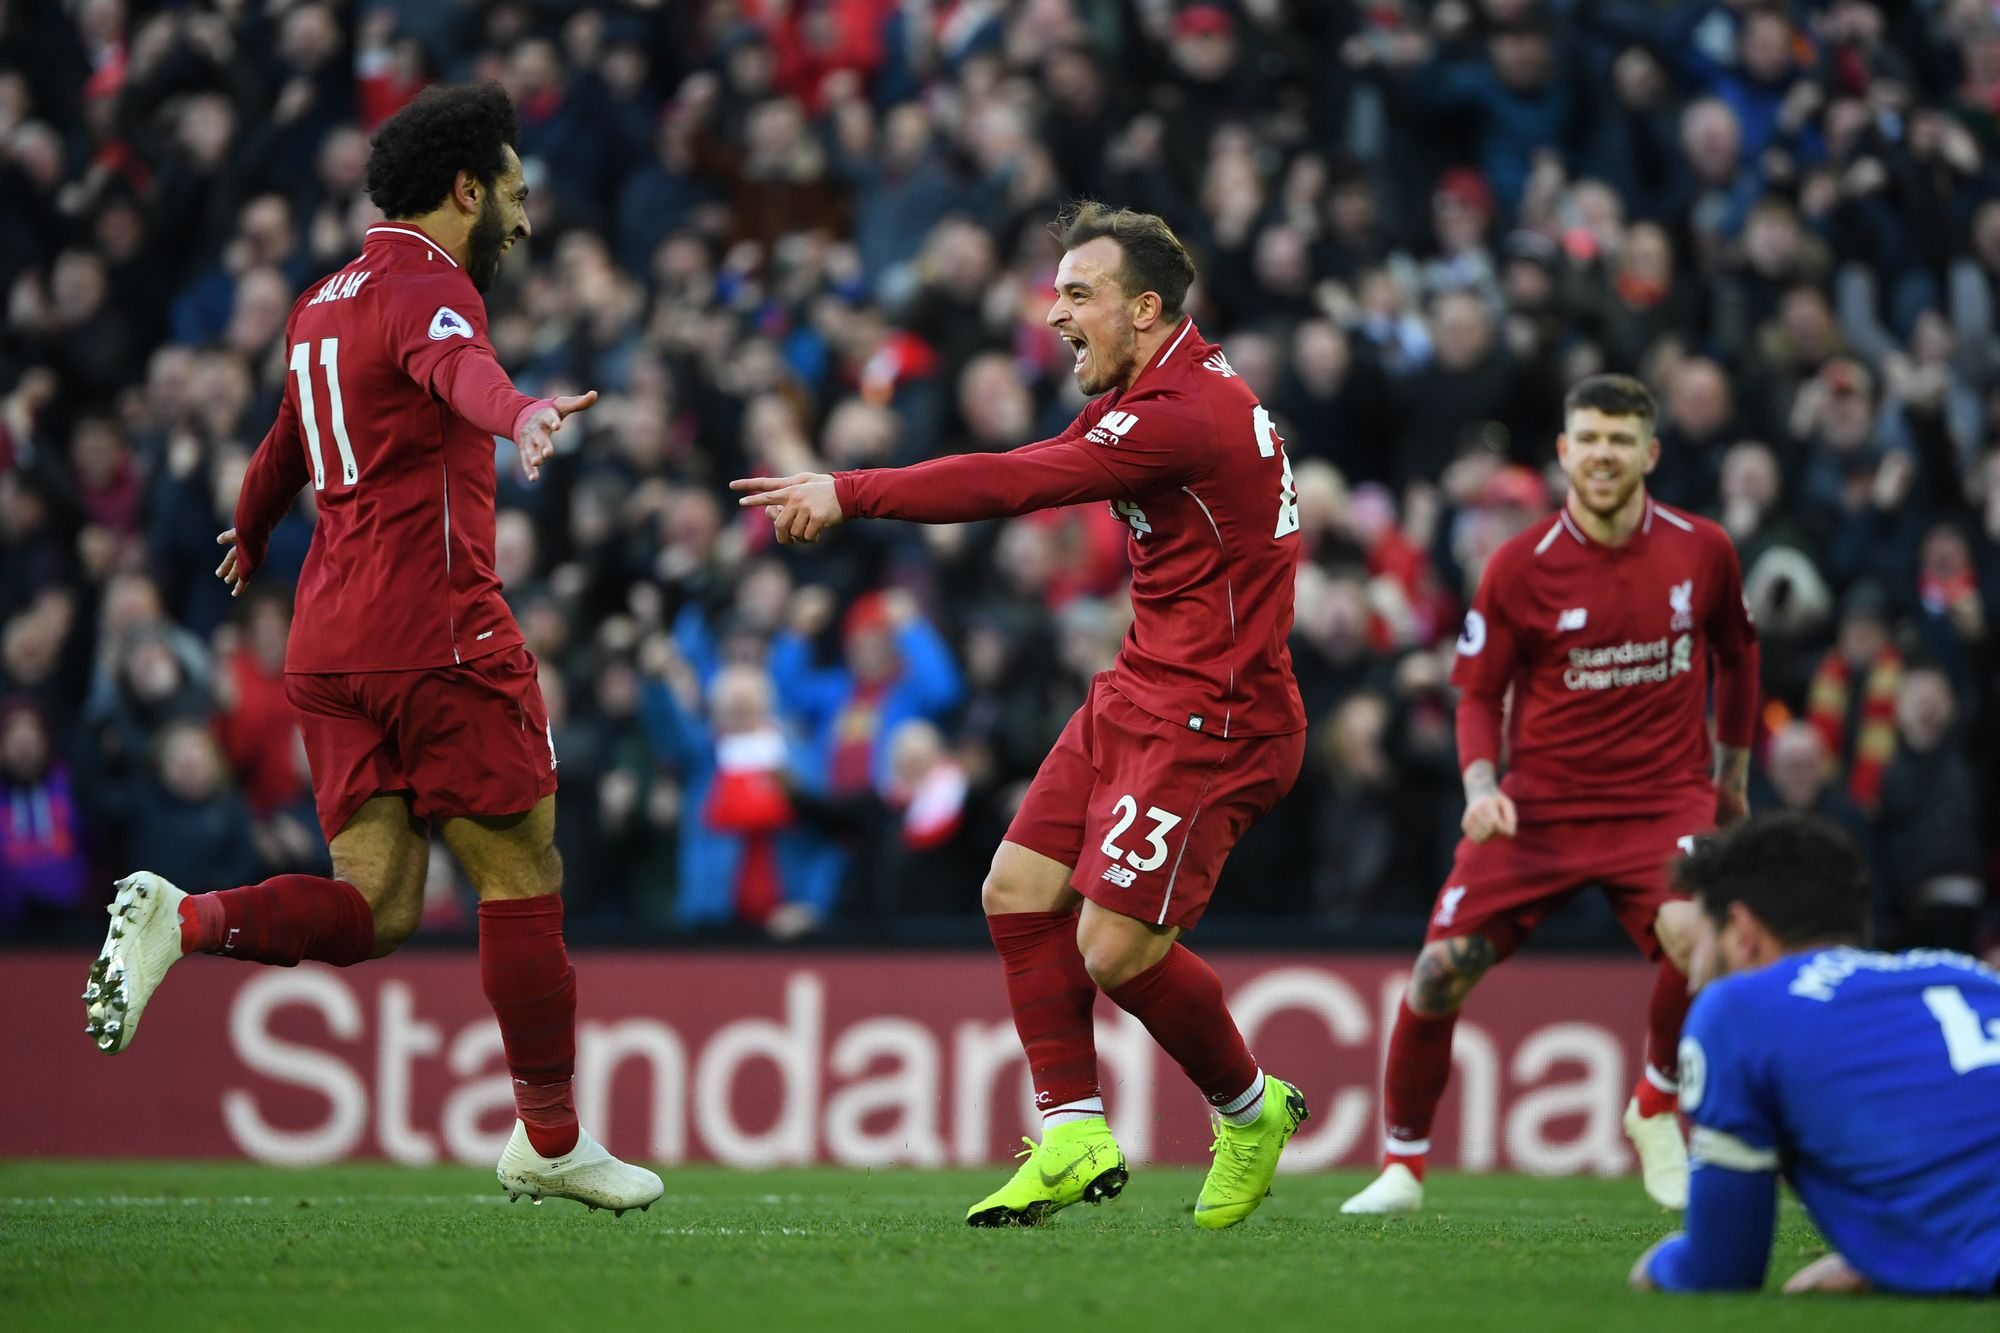 Liverpool vs Cardiff (4-1), doublé de Sadio Mané !